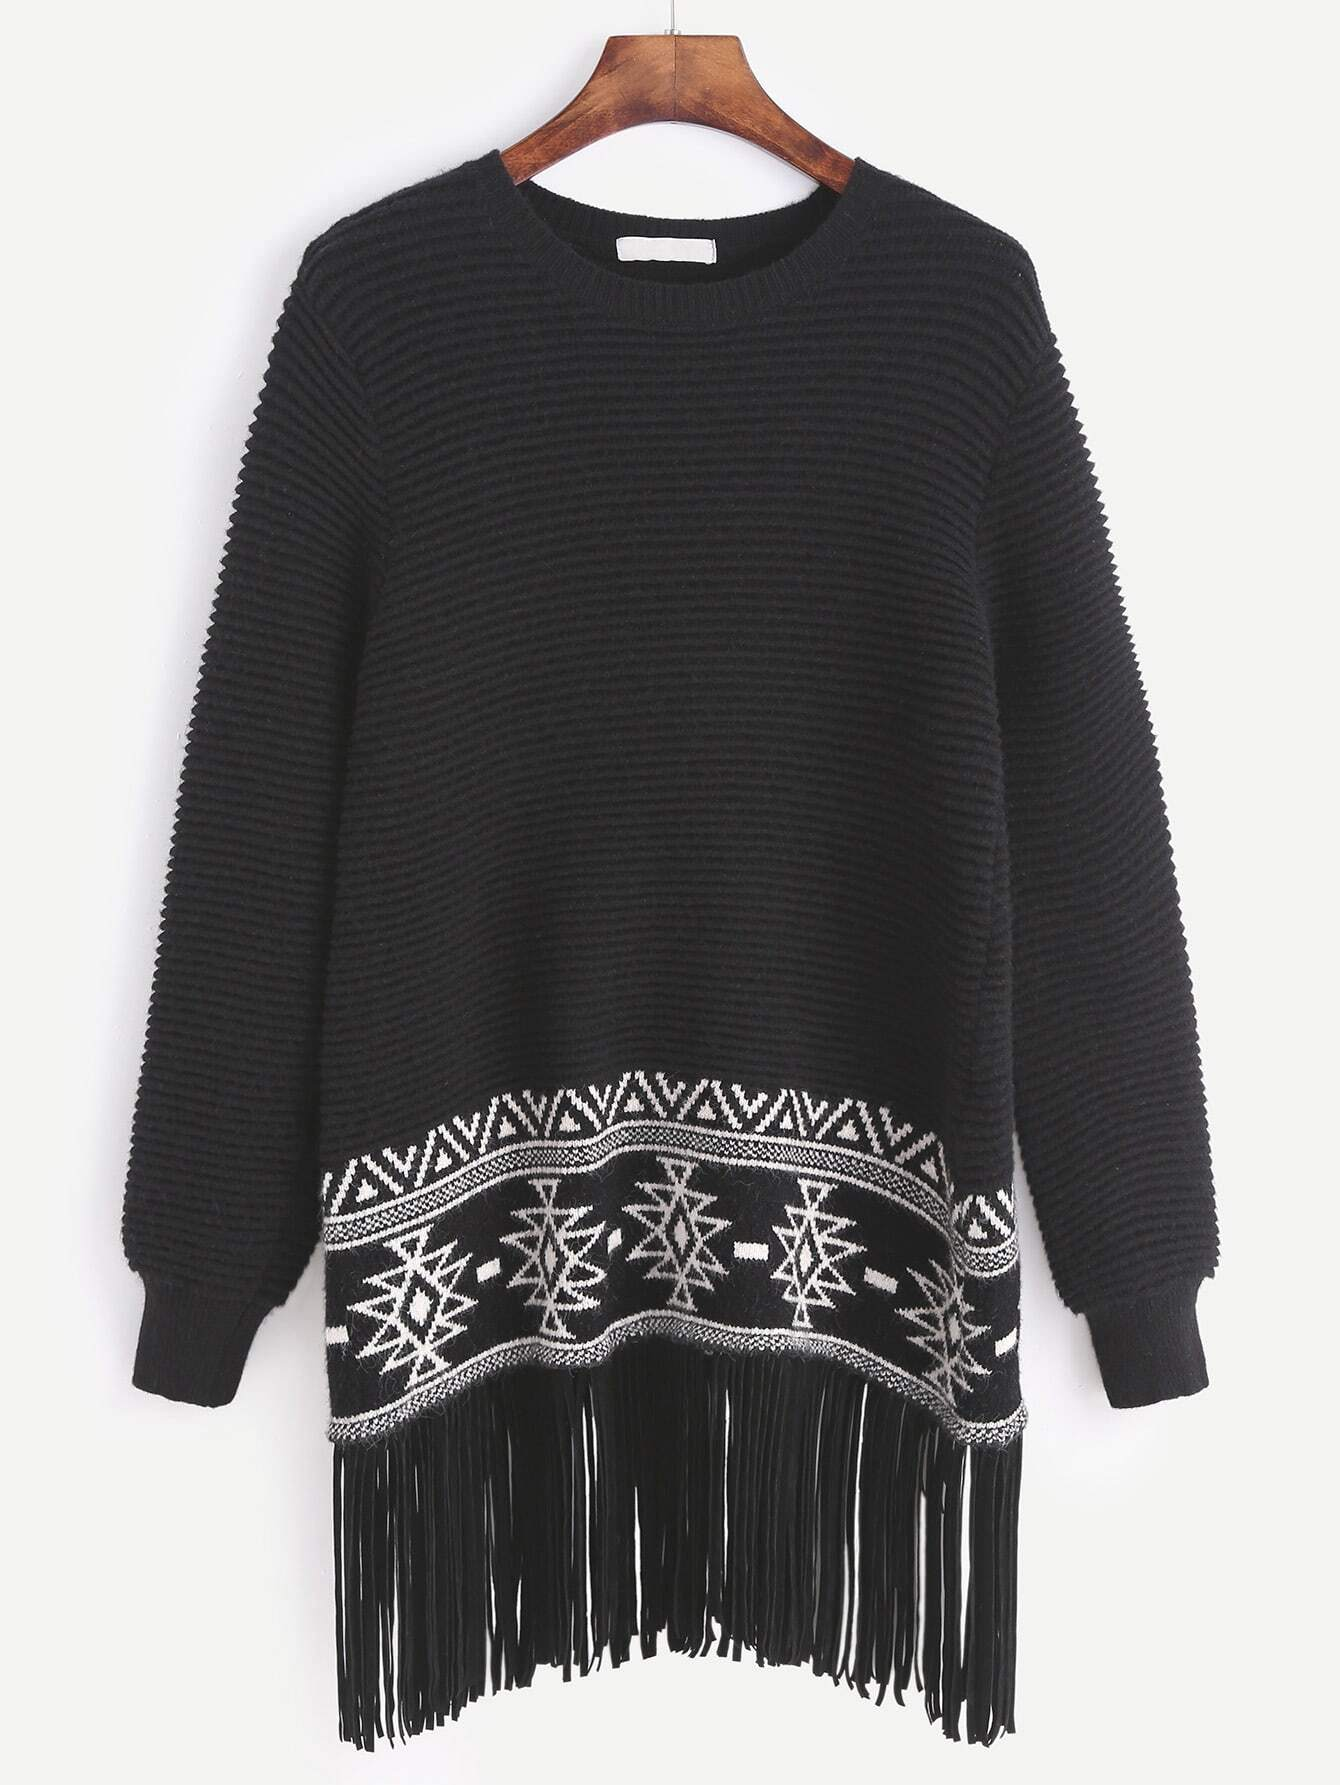 Black Ribbed Knit Tribal Pattern Fringe SweaterBlack Ribbed Knit Tribal Pattern Fringe Sweater<br><br>color: White<br>size: one-size